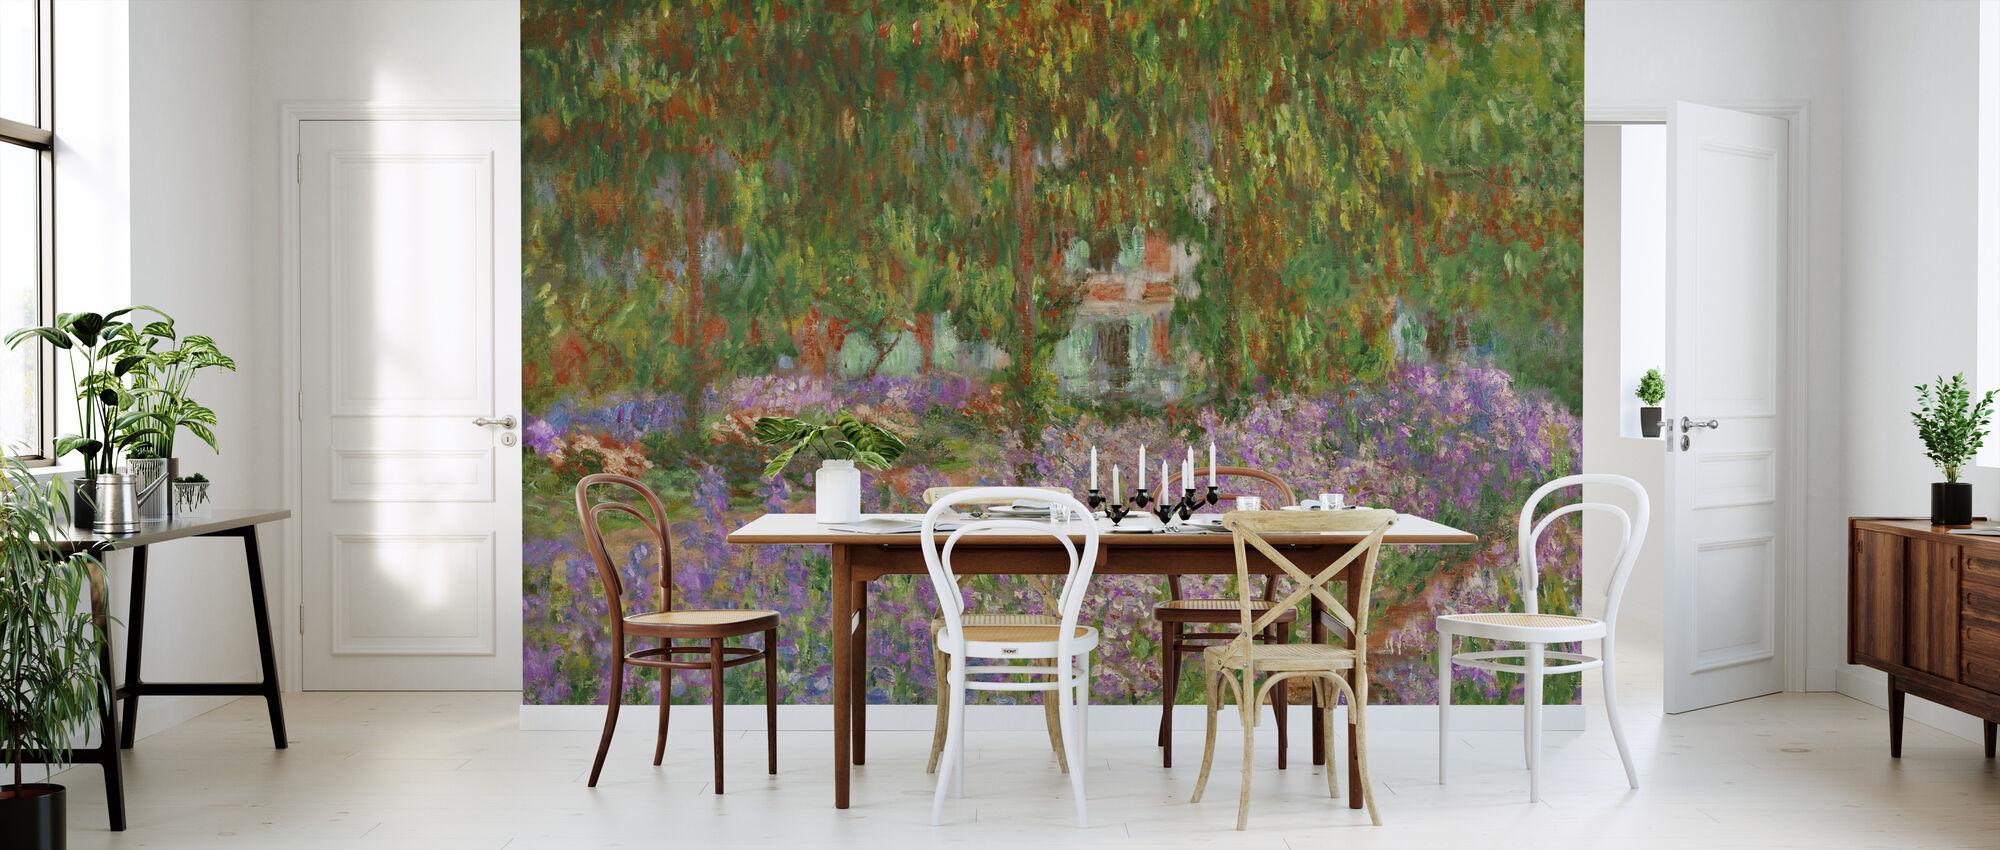 Garden at Giverny - Claude Monet - Wallpaper - Kitchen